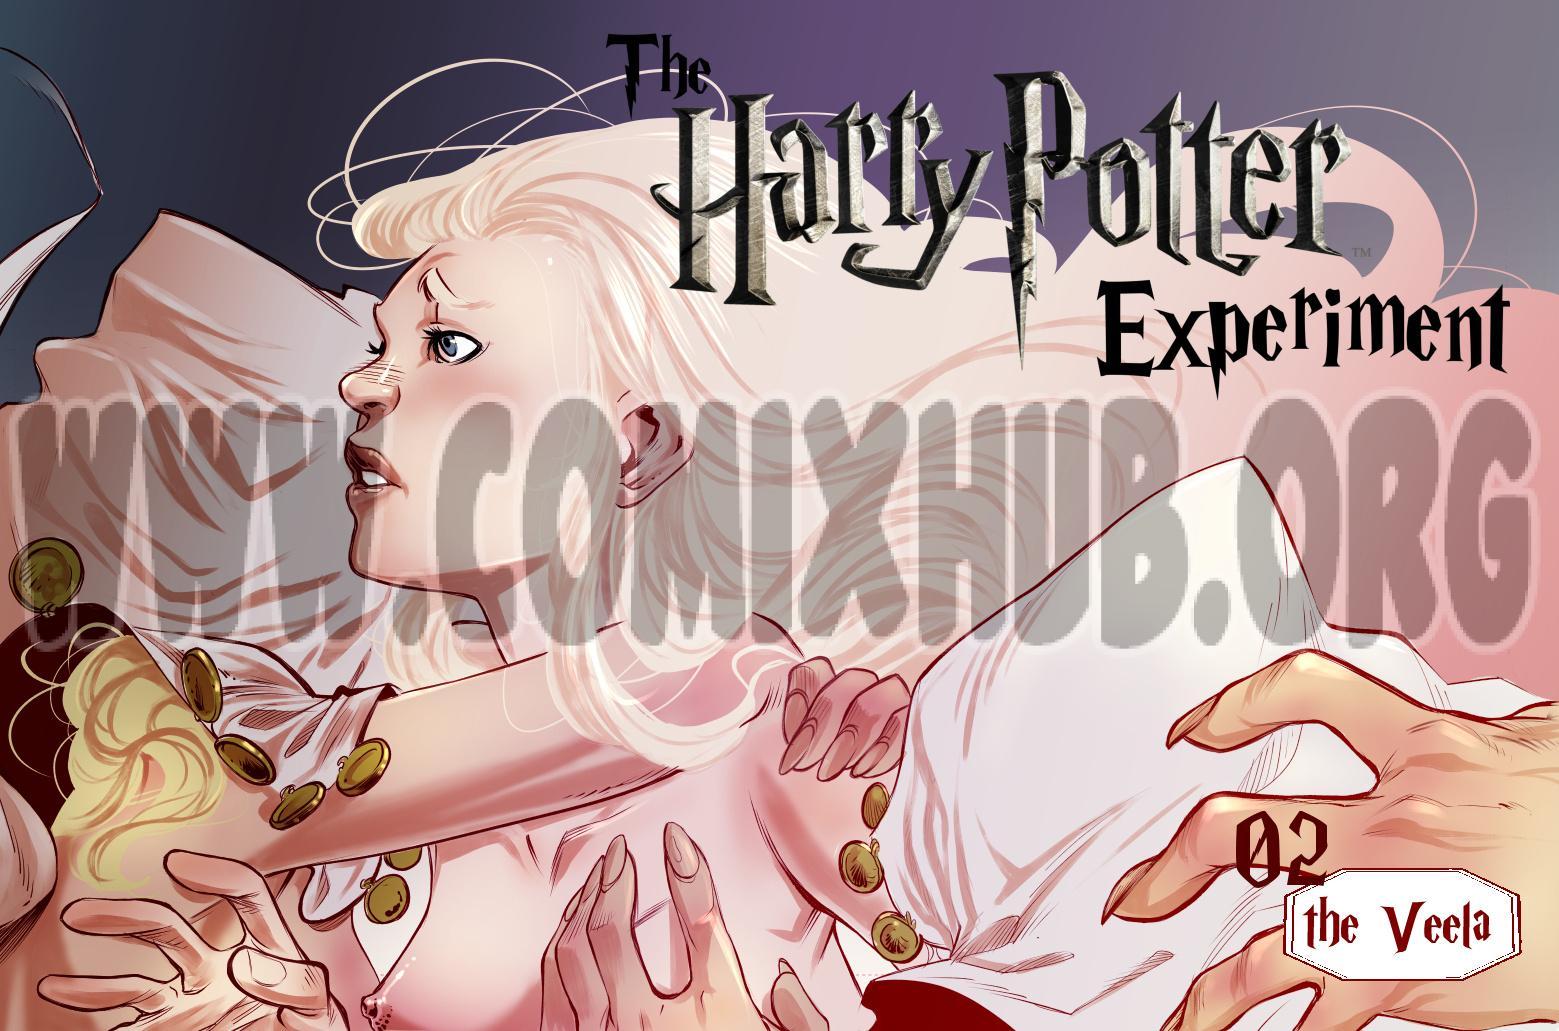 Harry Potter Experience 2 : The Veela porn comics Oral sex, Creampie, cunnilingus, fingering, Lesbians, Masturbation, Straight